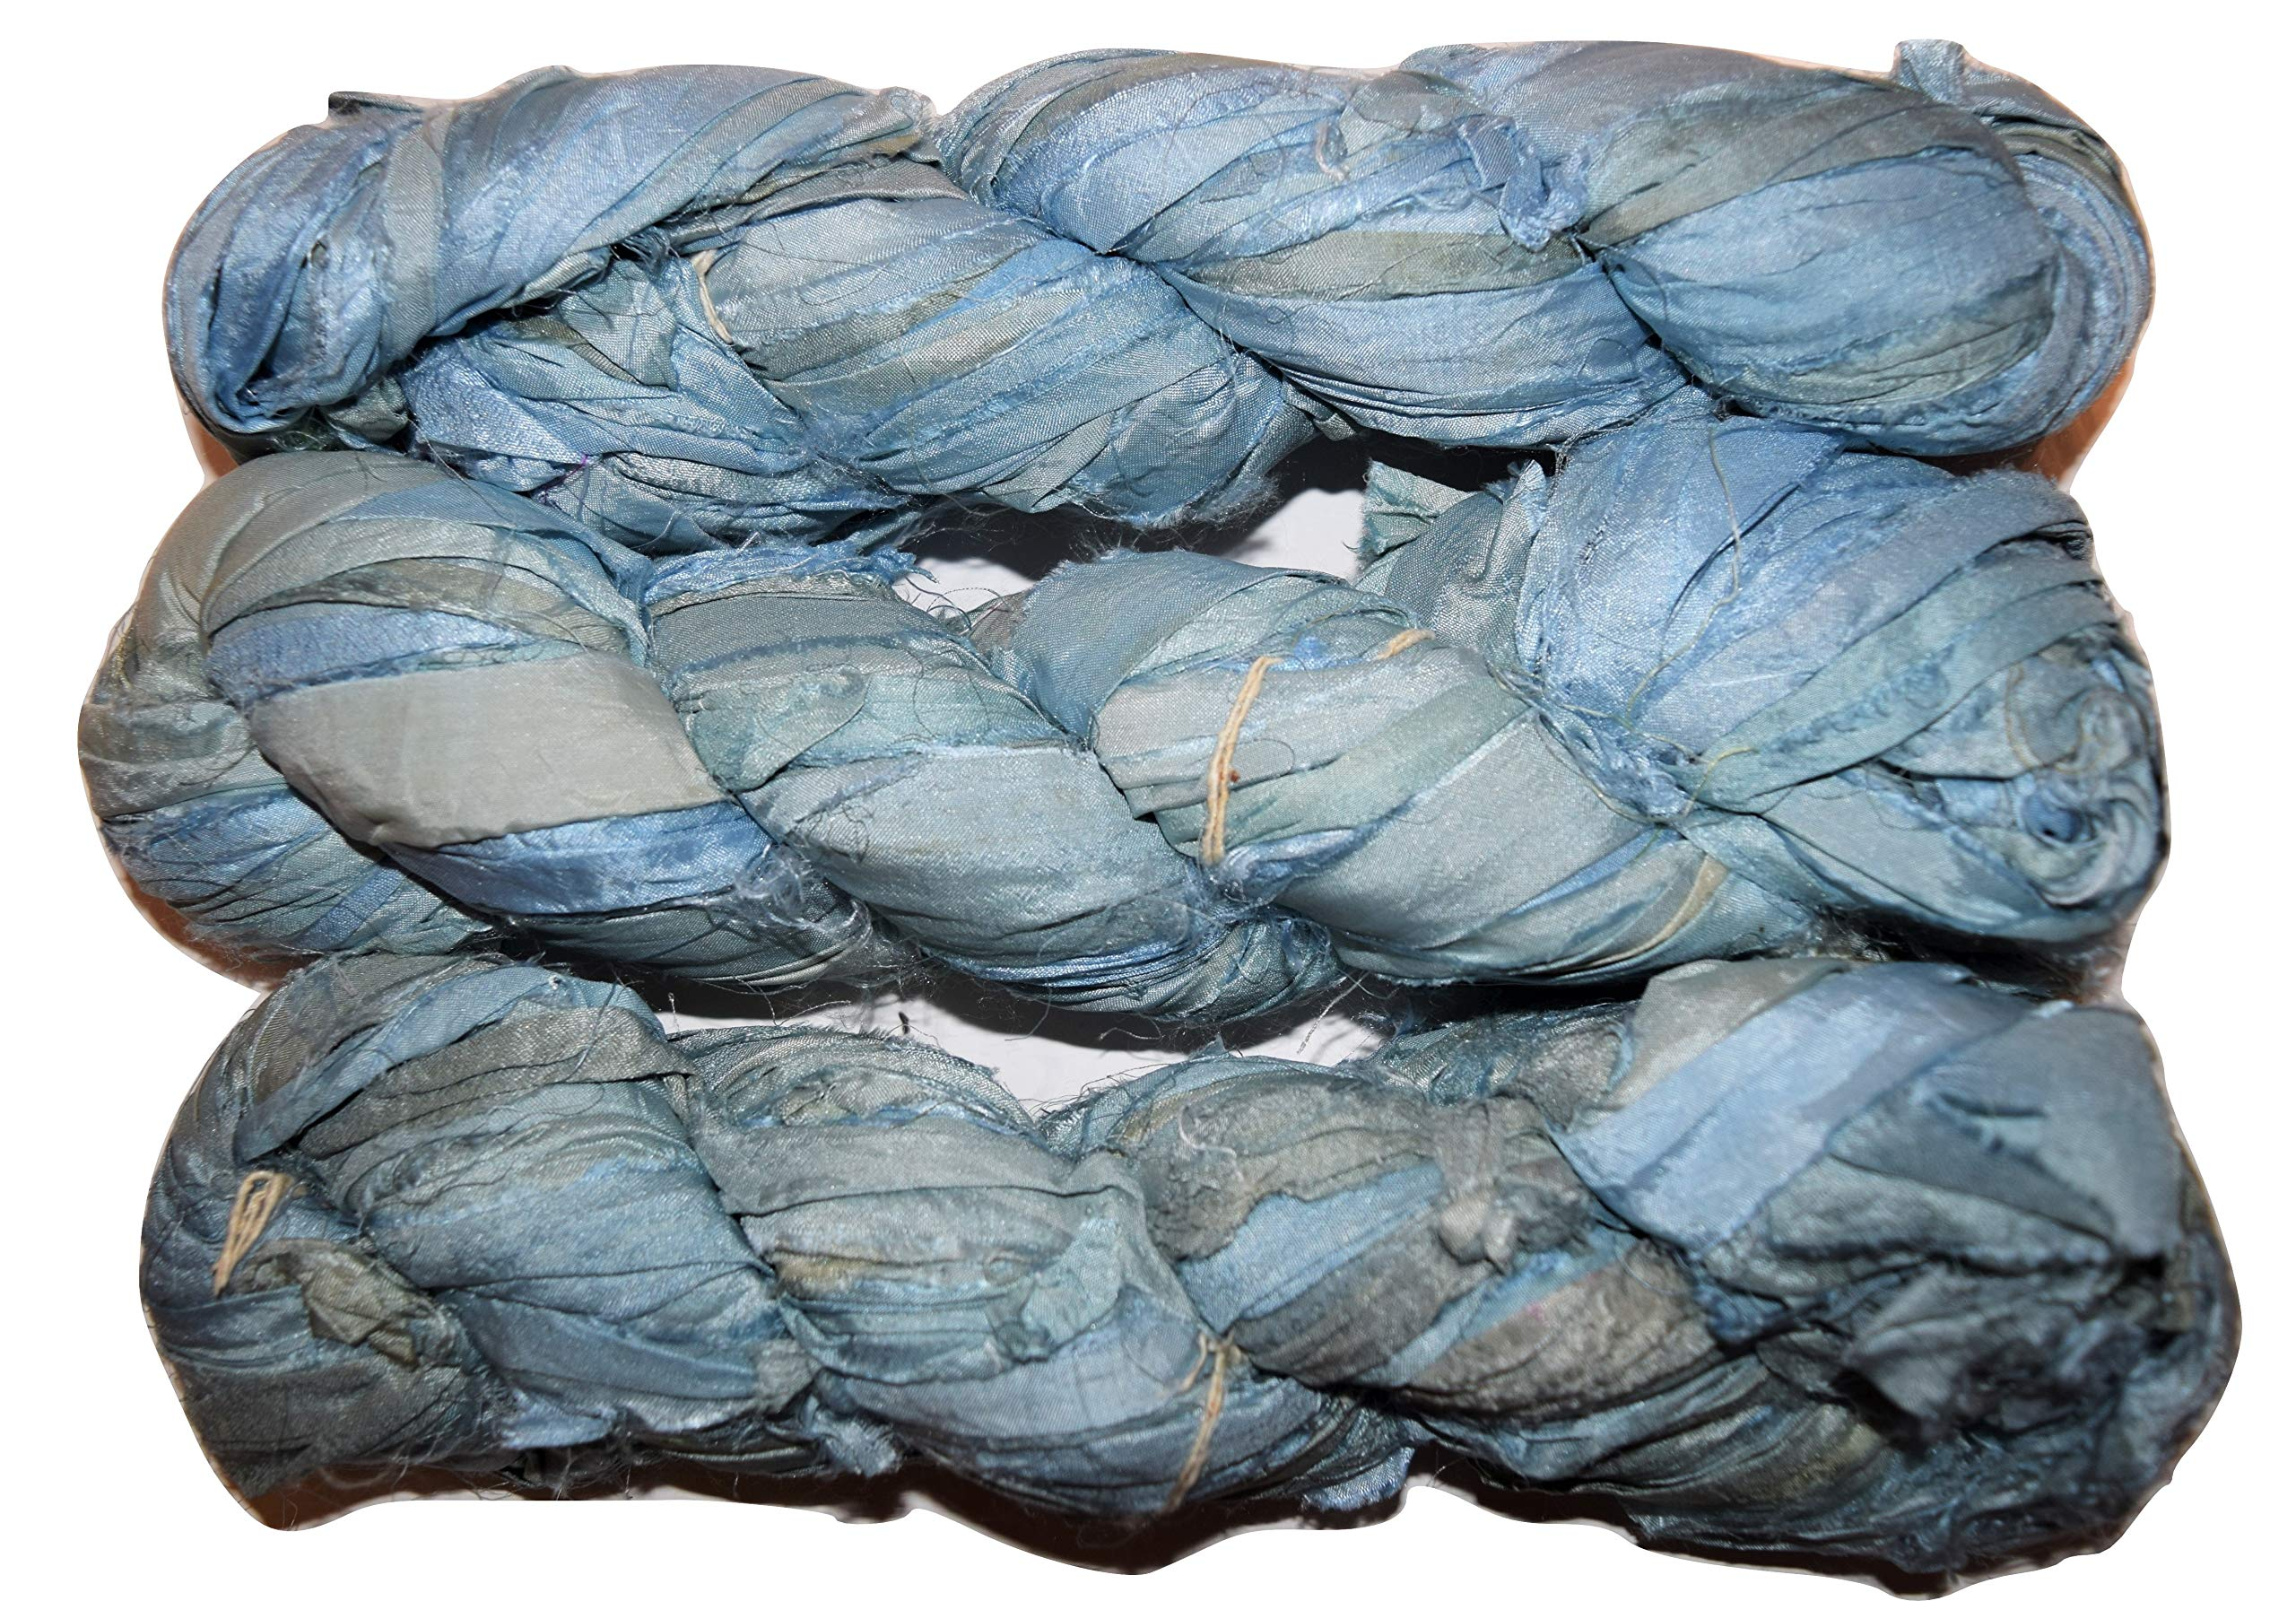 Prussian Blue Jewelry Making Trim 100g Recycled Sari Silk Ribbon Yarn